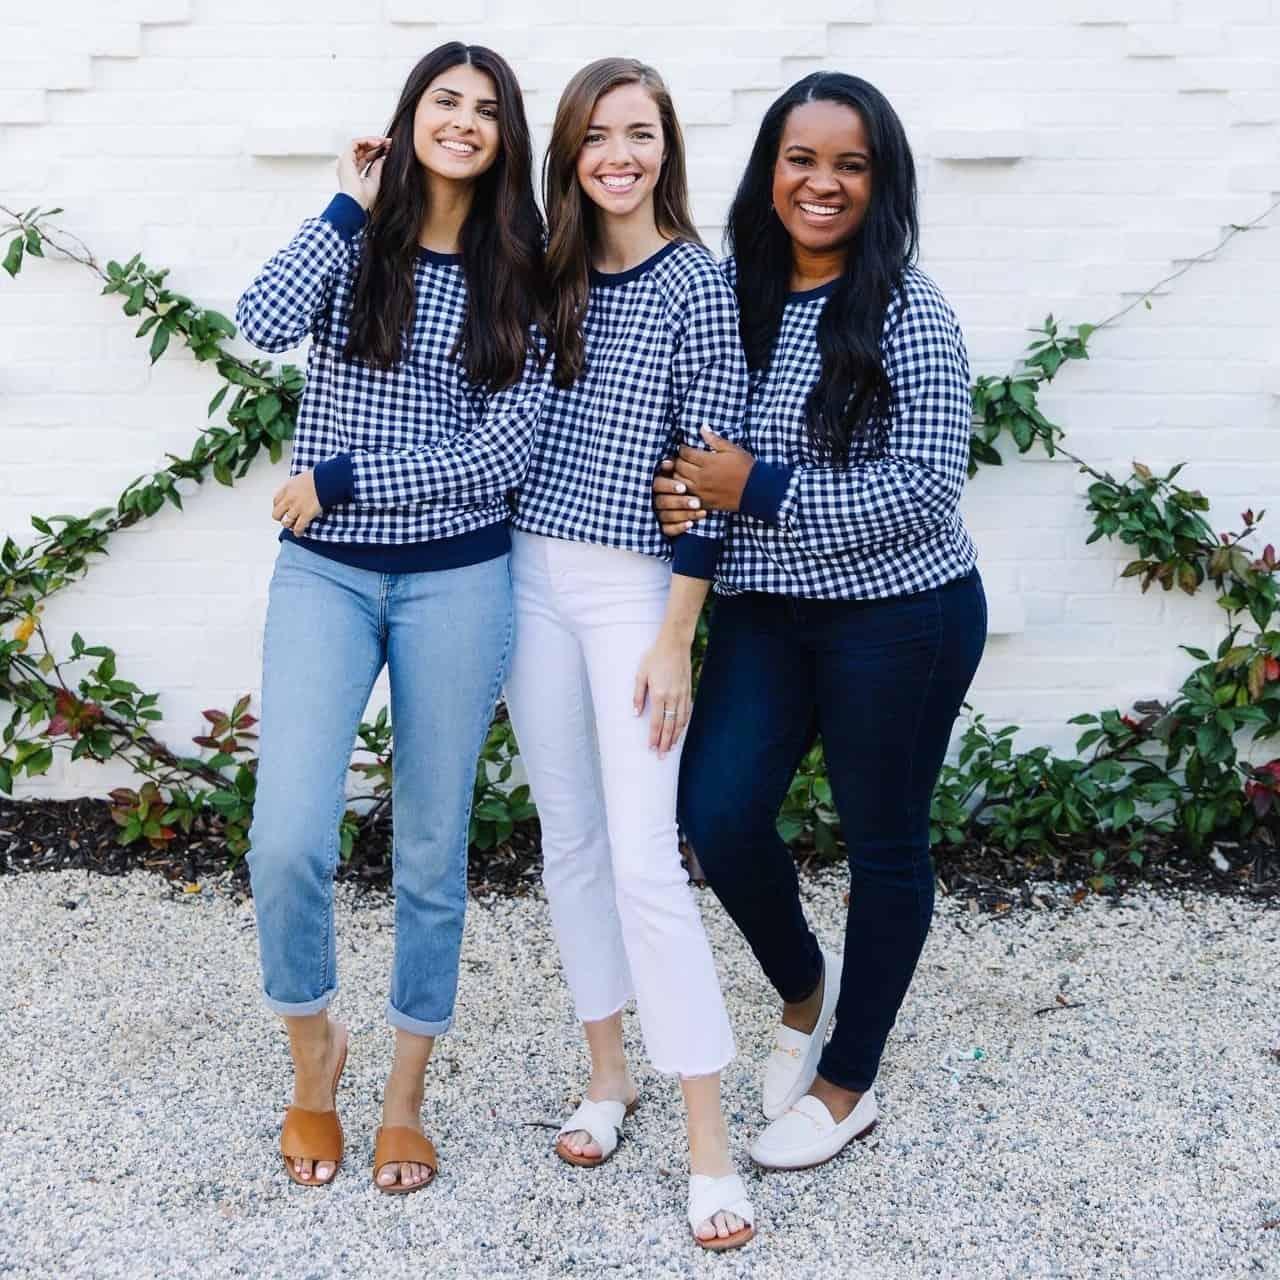 Behind The Scenes Draper James Trip by popular Dallas fashion blog, Glamorous Versatility: image of a three women wearing a Draper James blue gingham sweatshirts at The Park on Saint Simons Island.